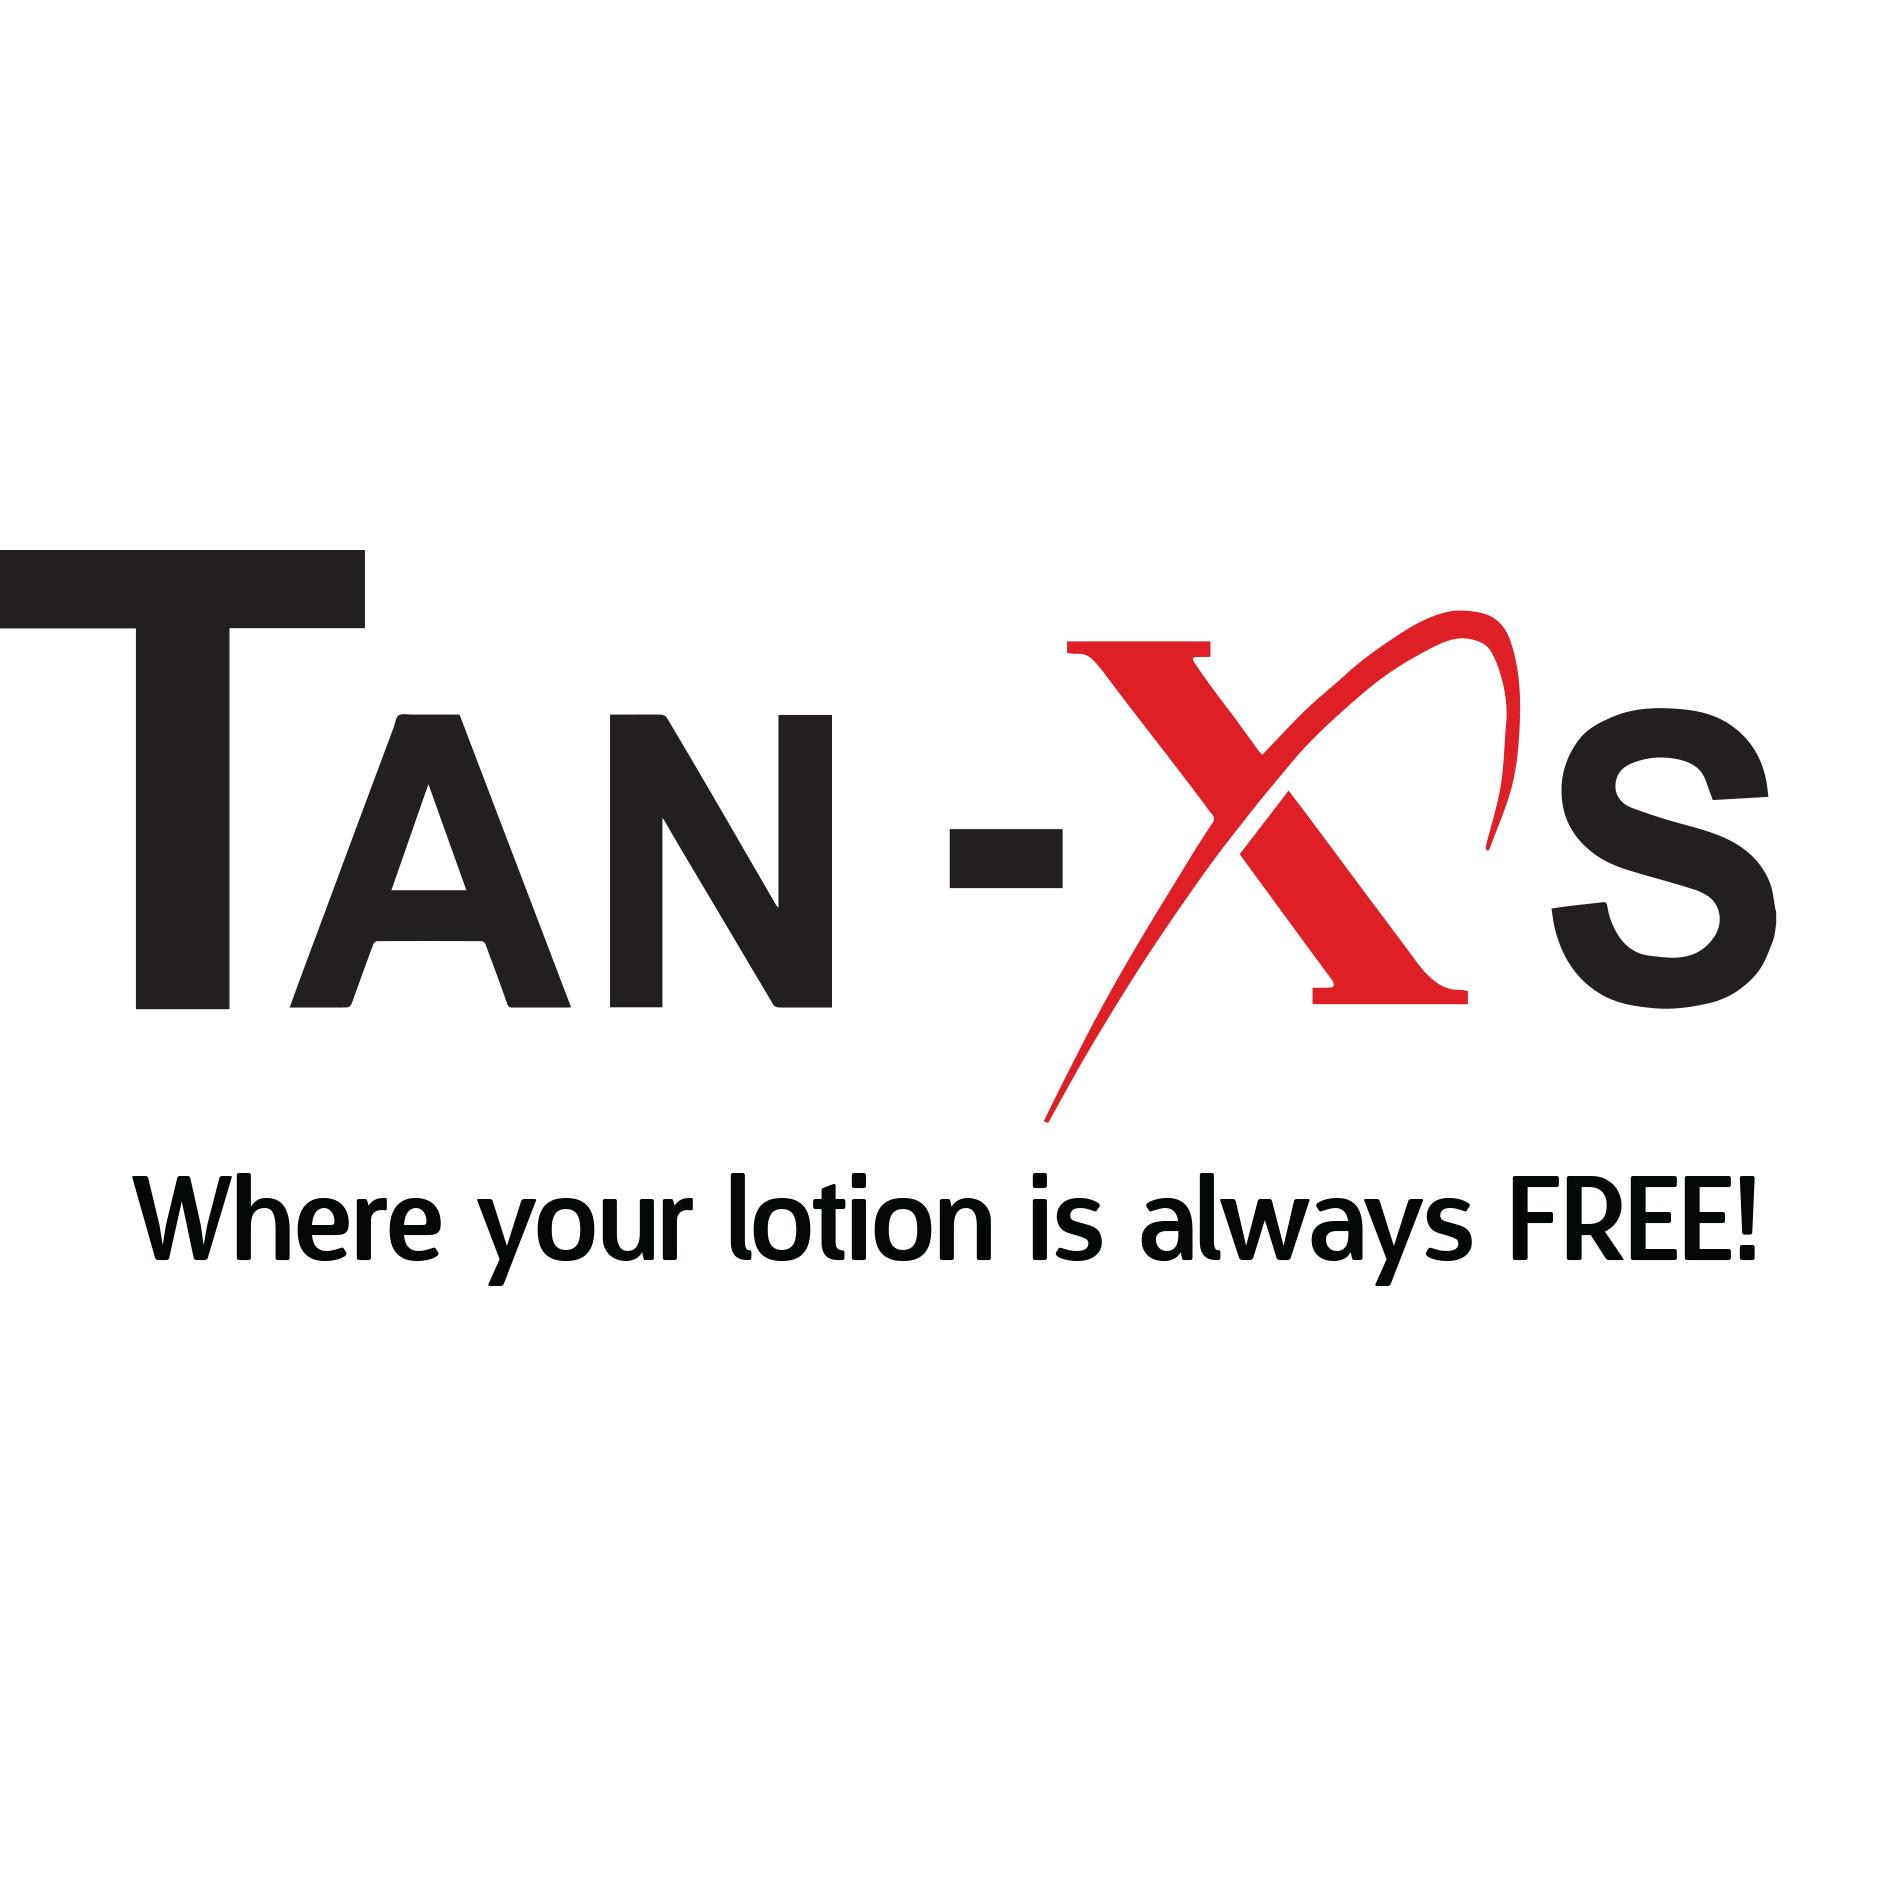 Tan XS image 5